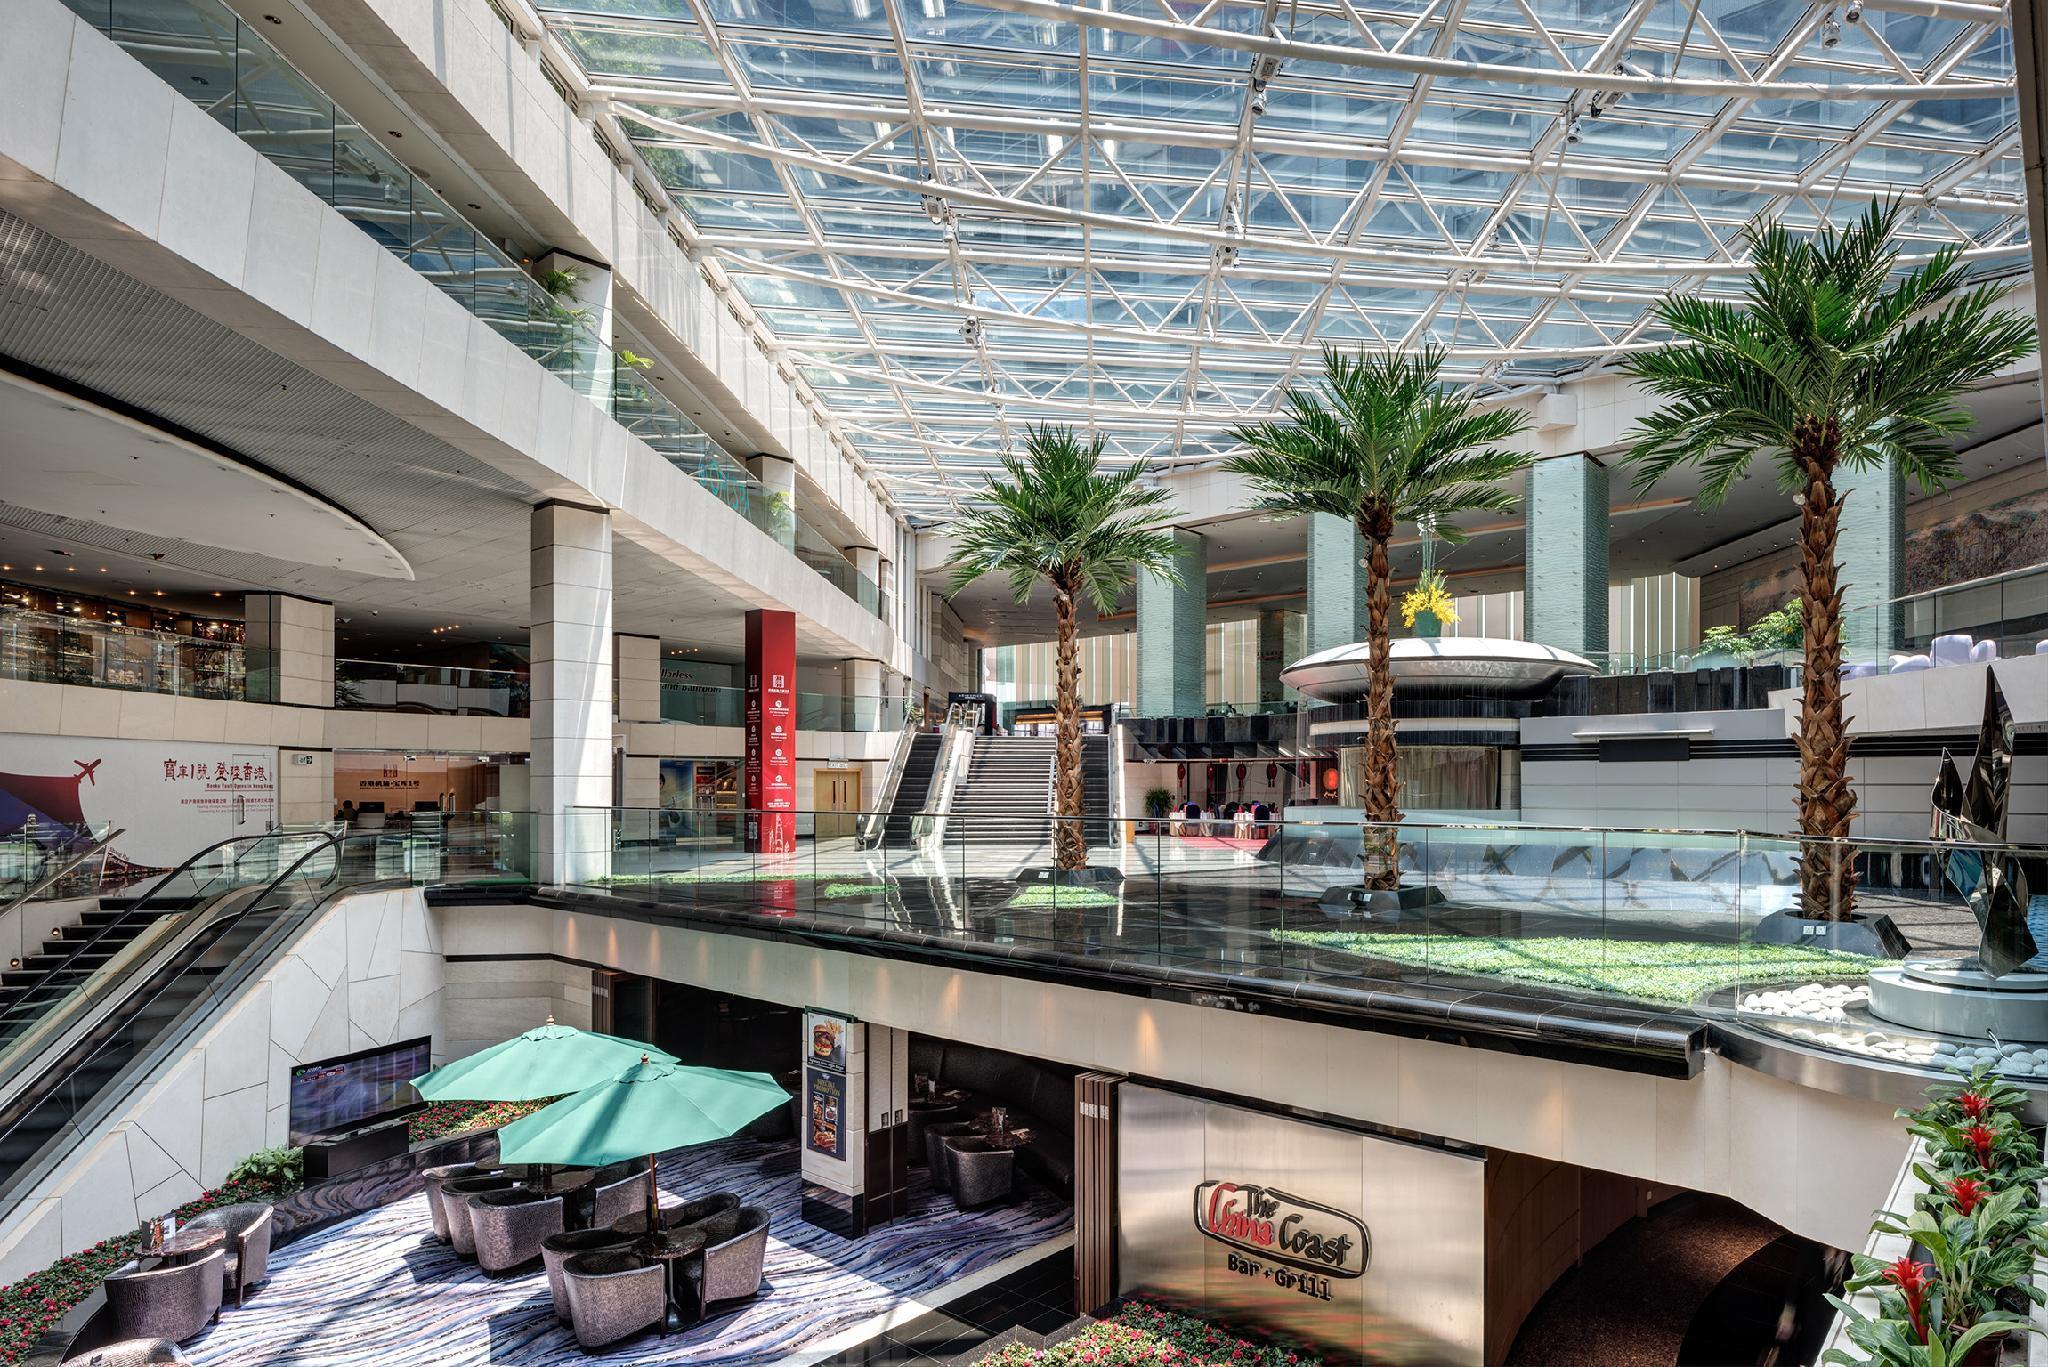 Regal Airport Hotel Hong Kong  Boek een aanbieding op